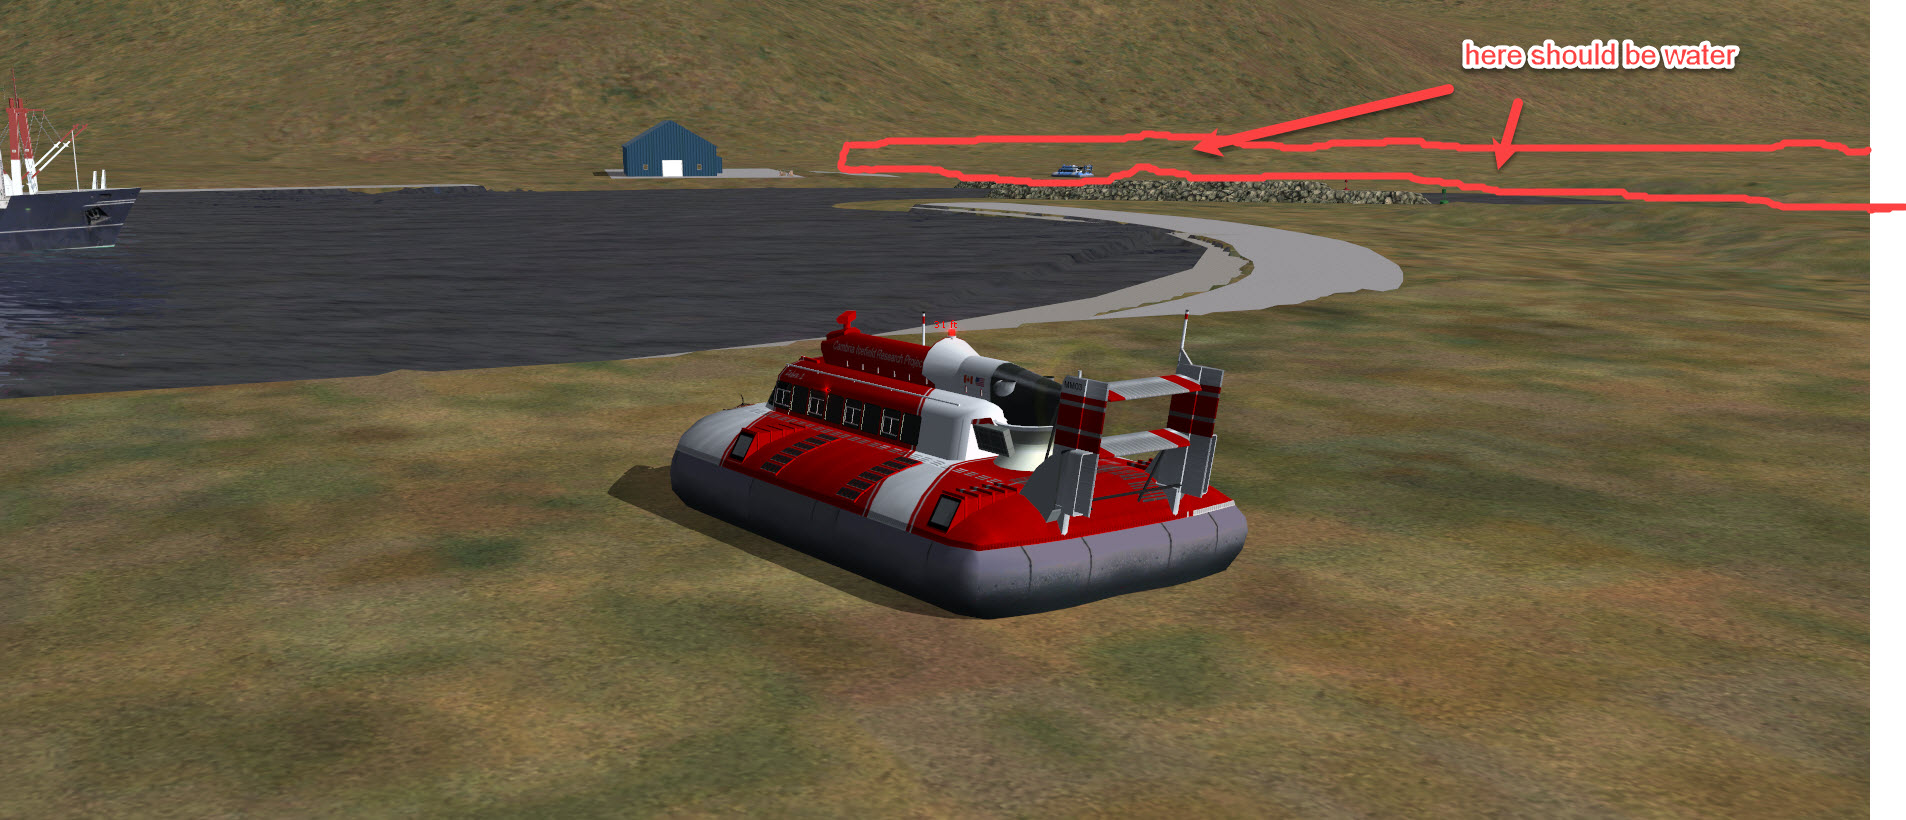 7AK Akutan Harbor-3.jpg